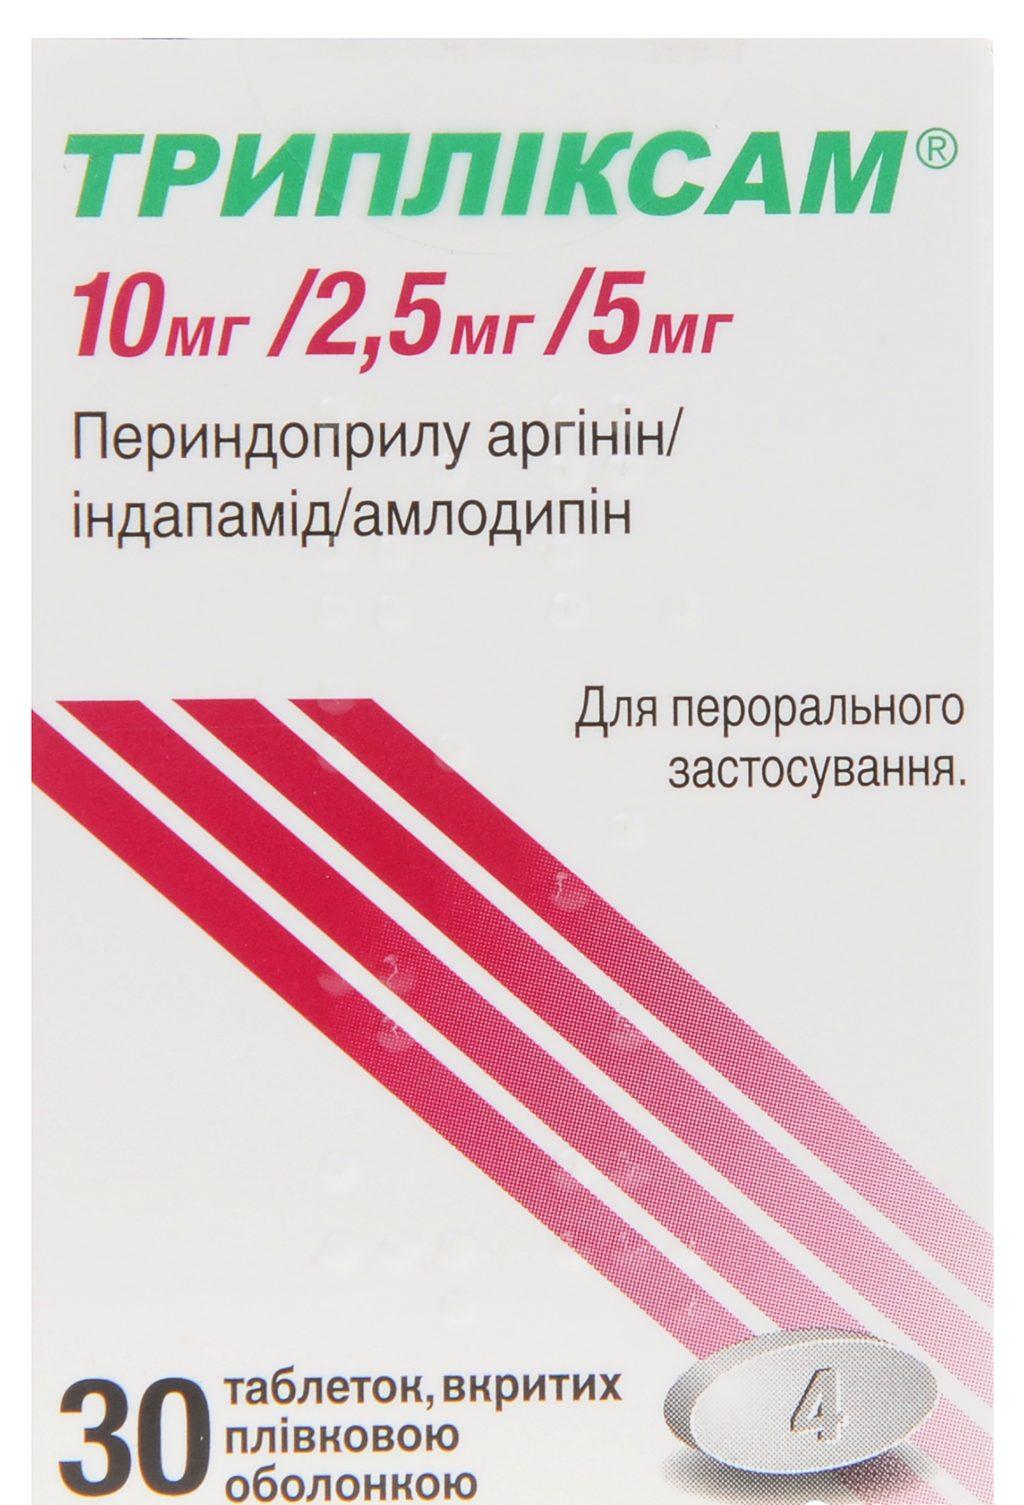 PERINDOPRIL/AMLODIPINE/INDAPAMIDE PHARMA-REGIST 2 mg/5 mg/0, mg tabletta